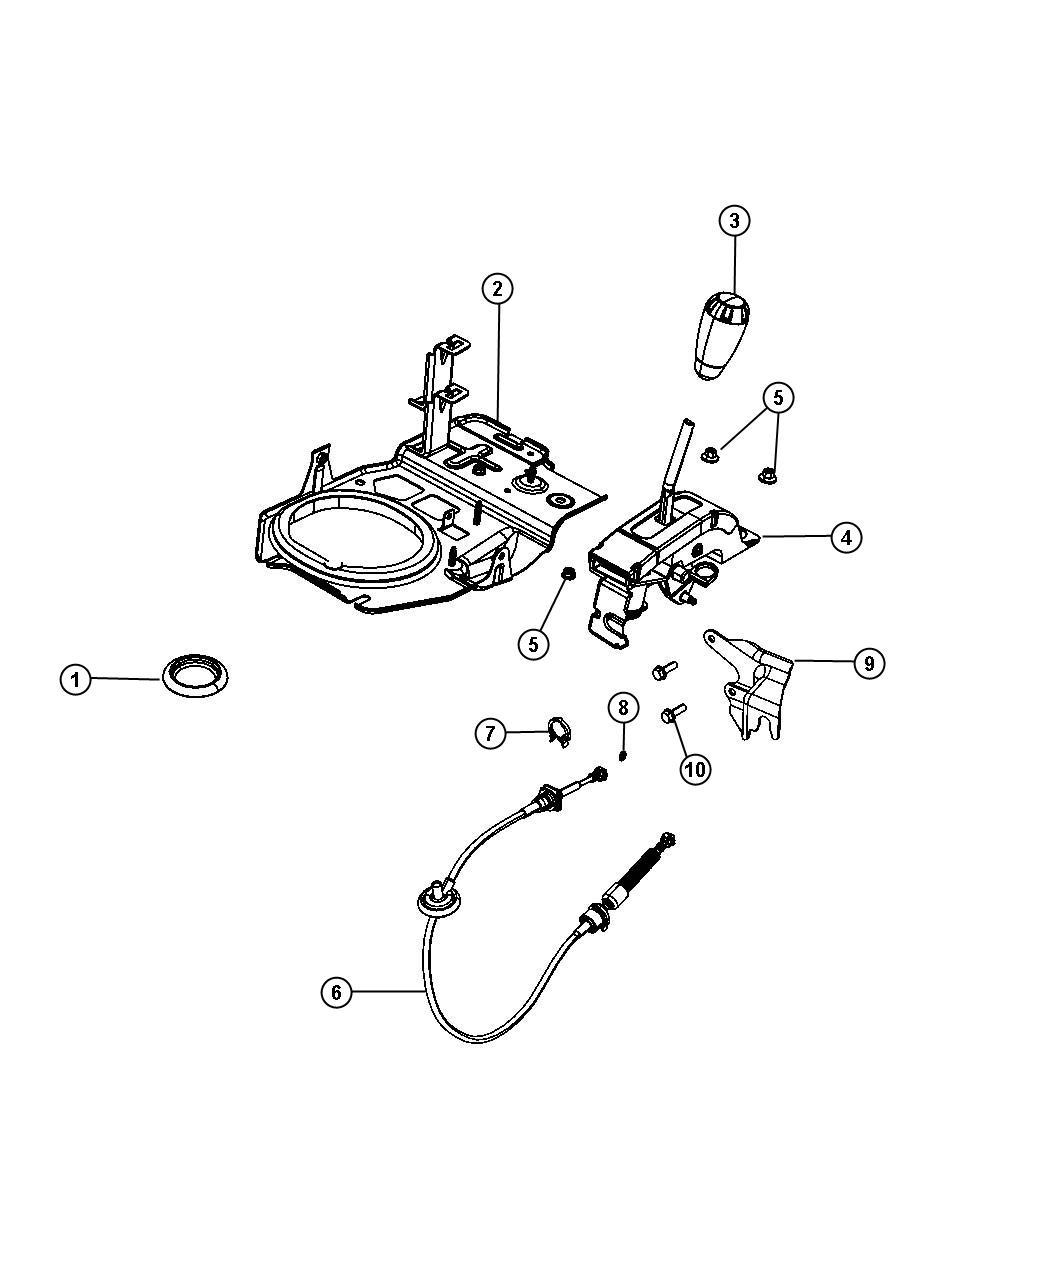 Jeep Wrangler 4x4 3 6l V6 Vvt 6 Speed Manual Nsg370 Shifter Assembly